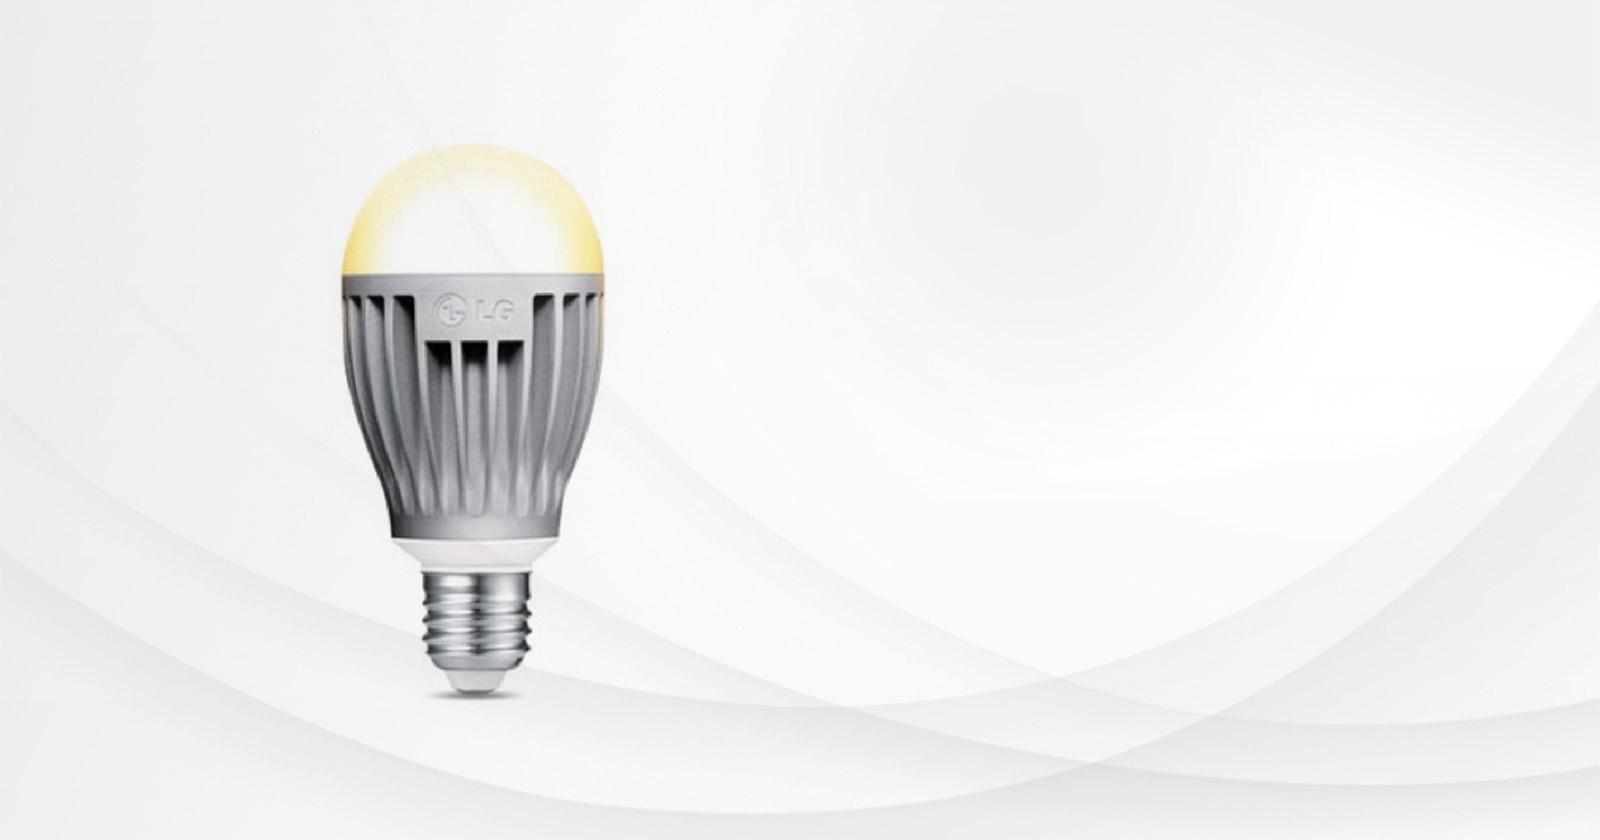 Lg led lights long lasting led light bulbs lg usa front view of an lg 60 watt equivalent a19 bulb parisarafo Choice Image